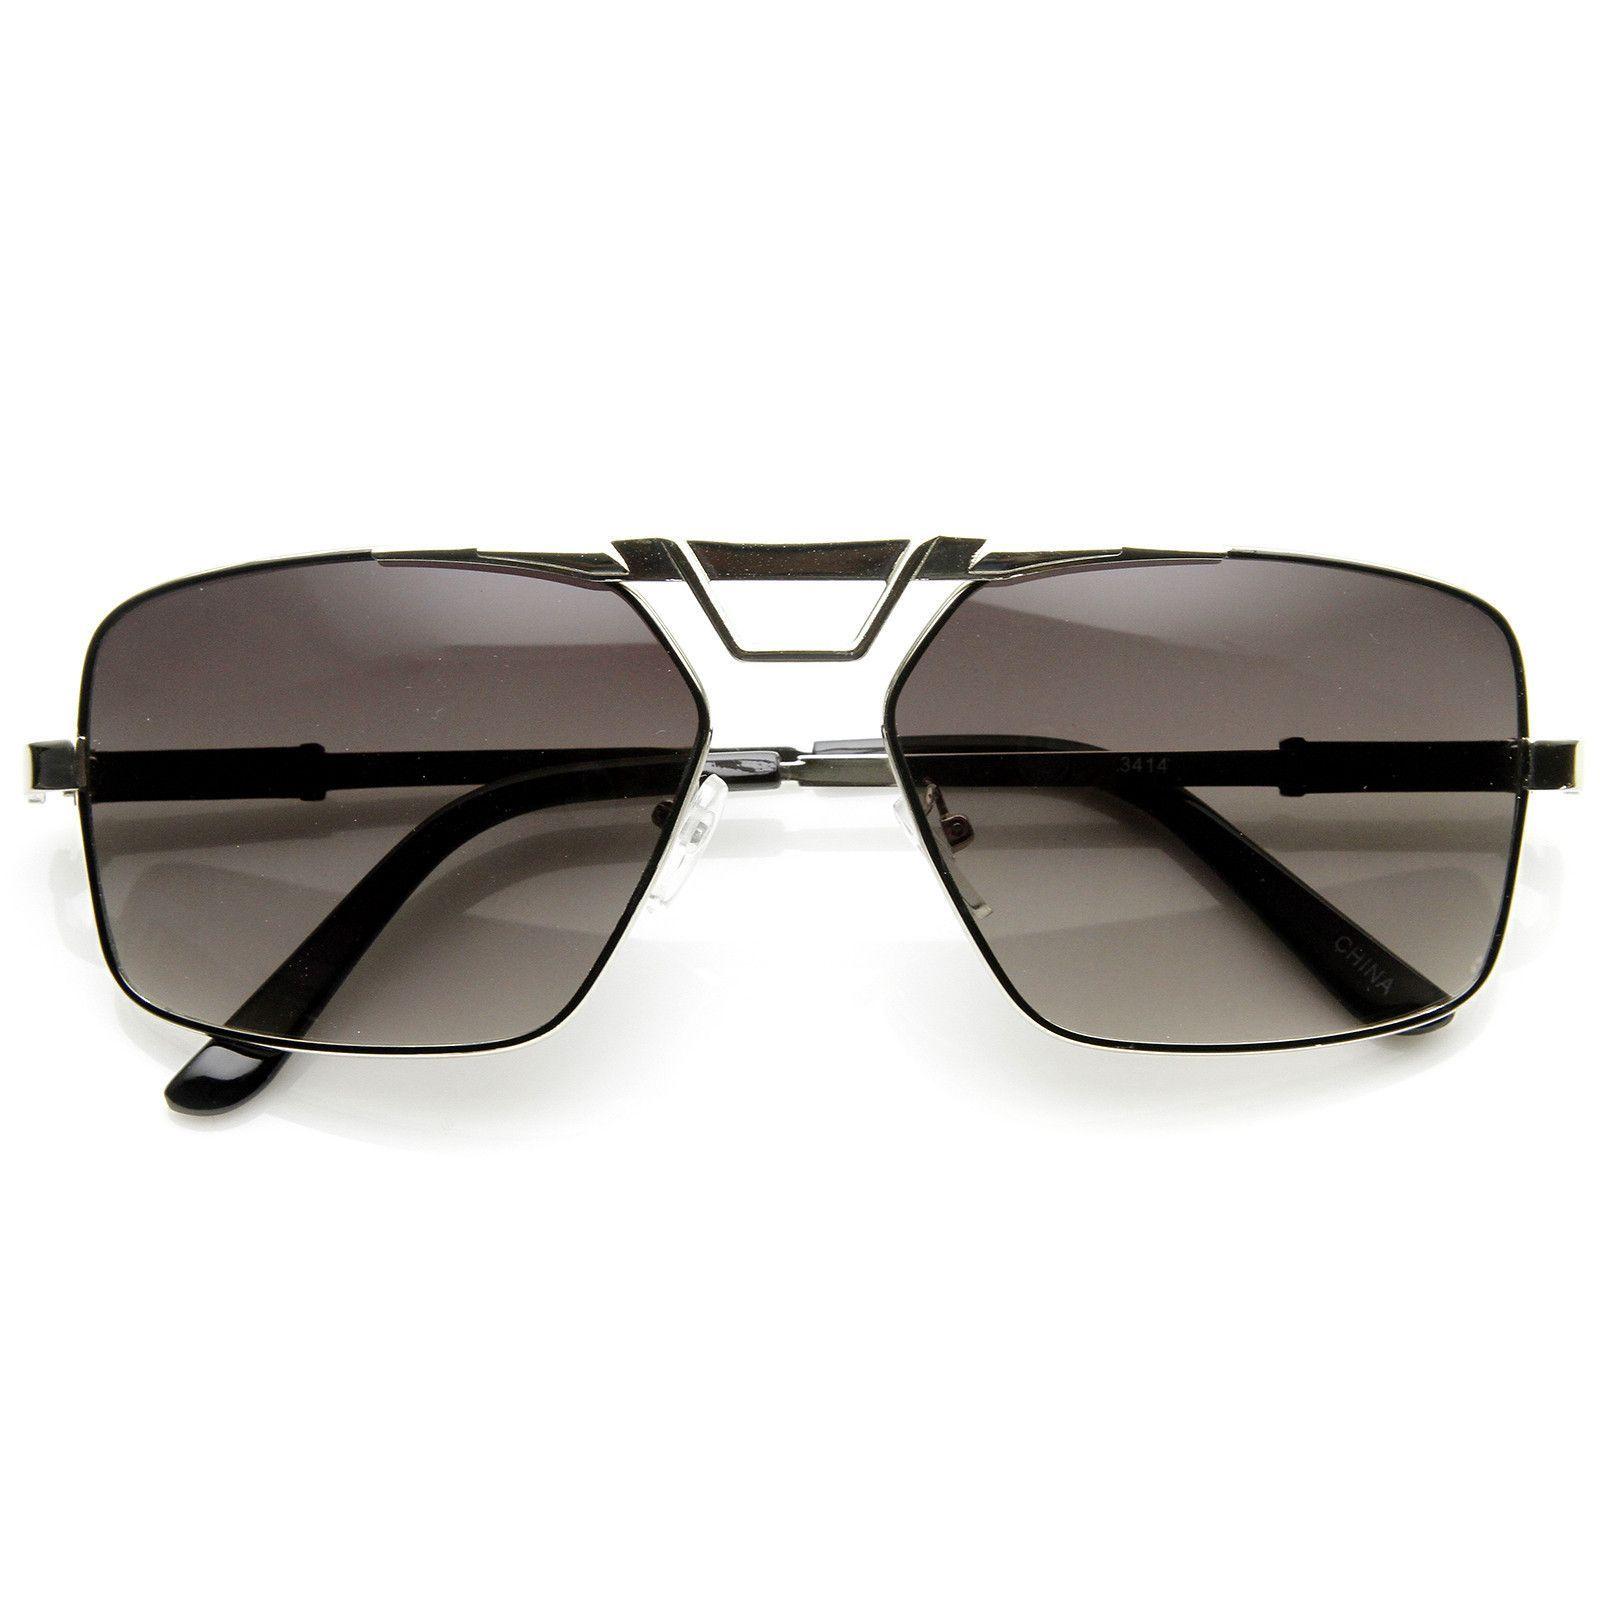 edea4f2aa8 Modern Mens GQ Fashion Large Square Metal Frame Aviator Sunglasses 8988